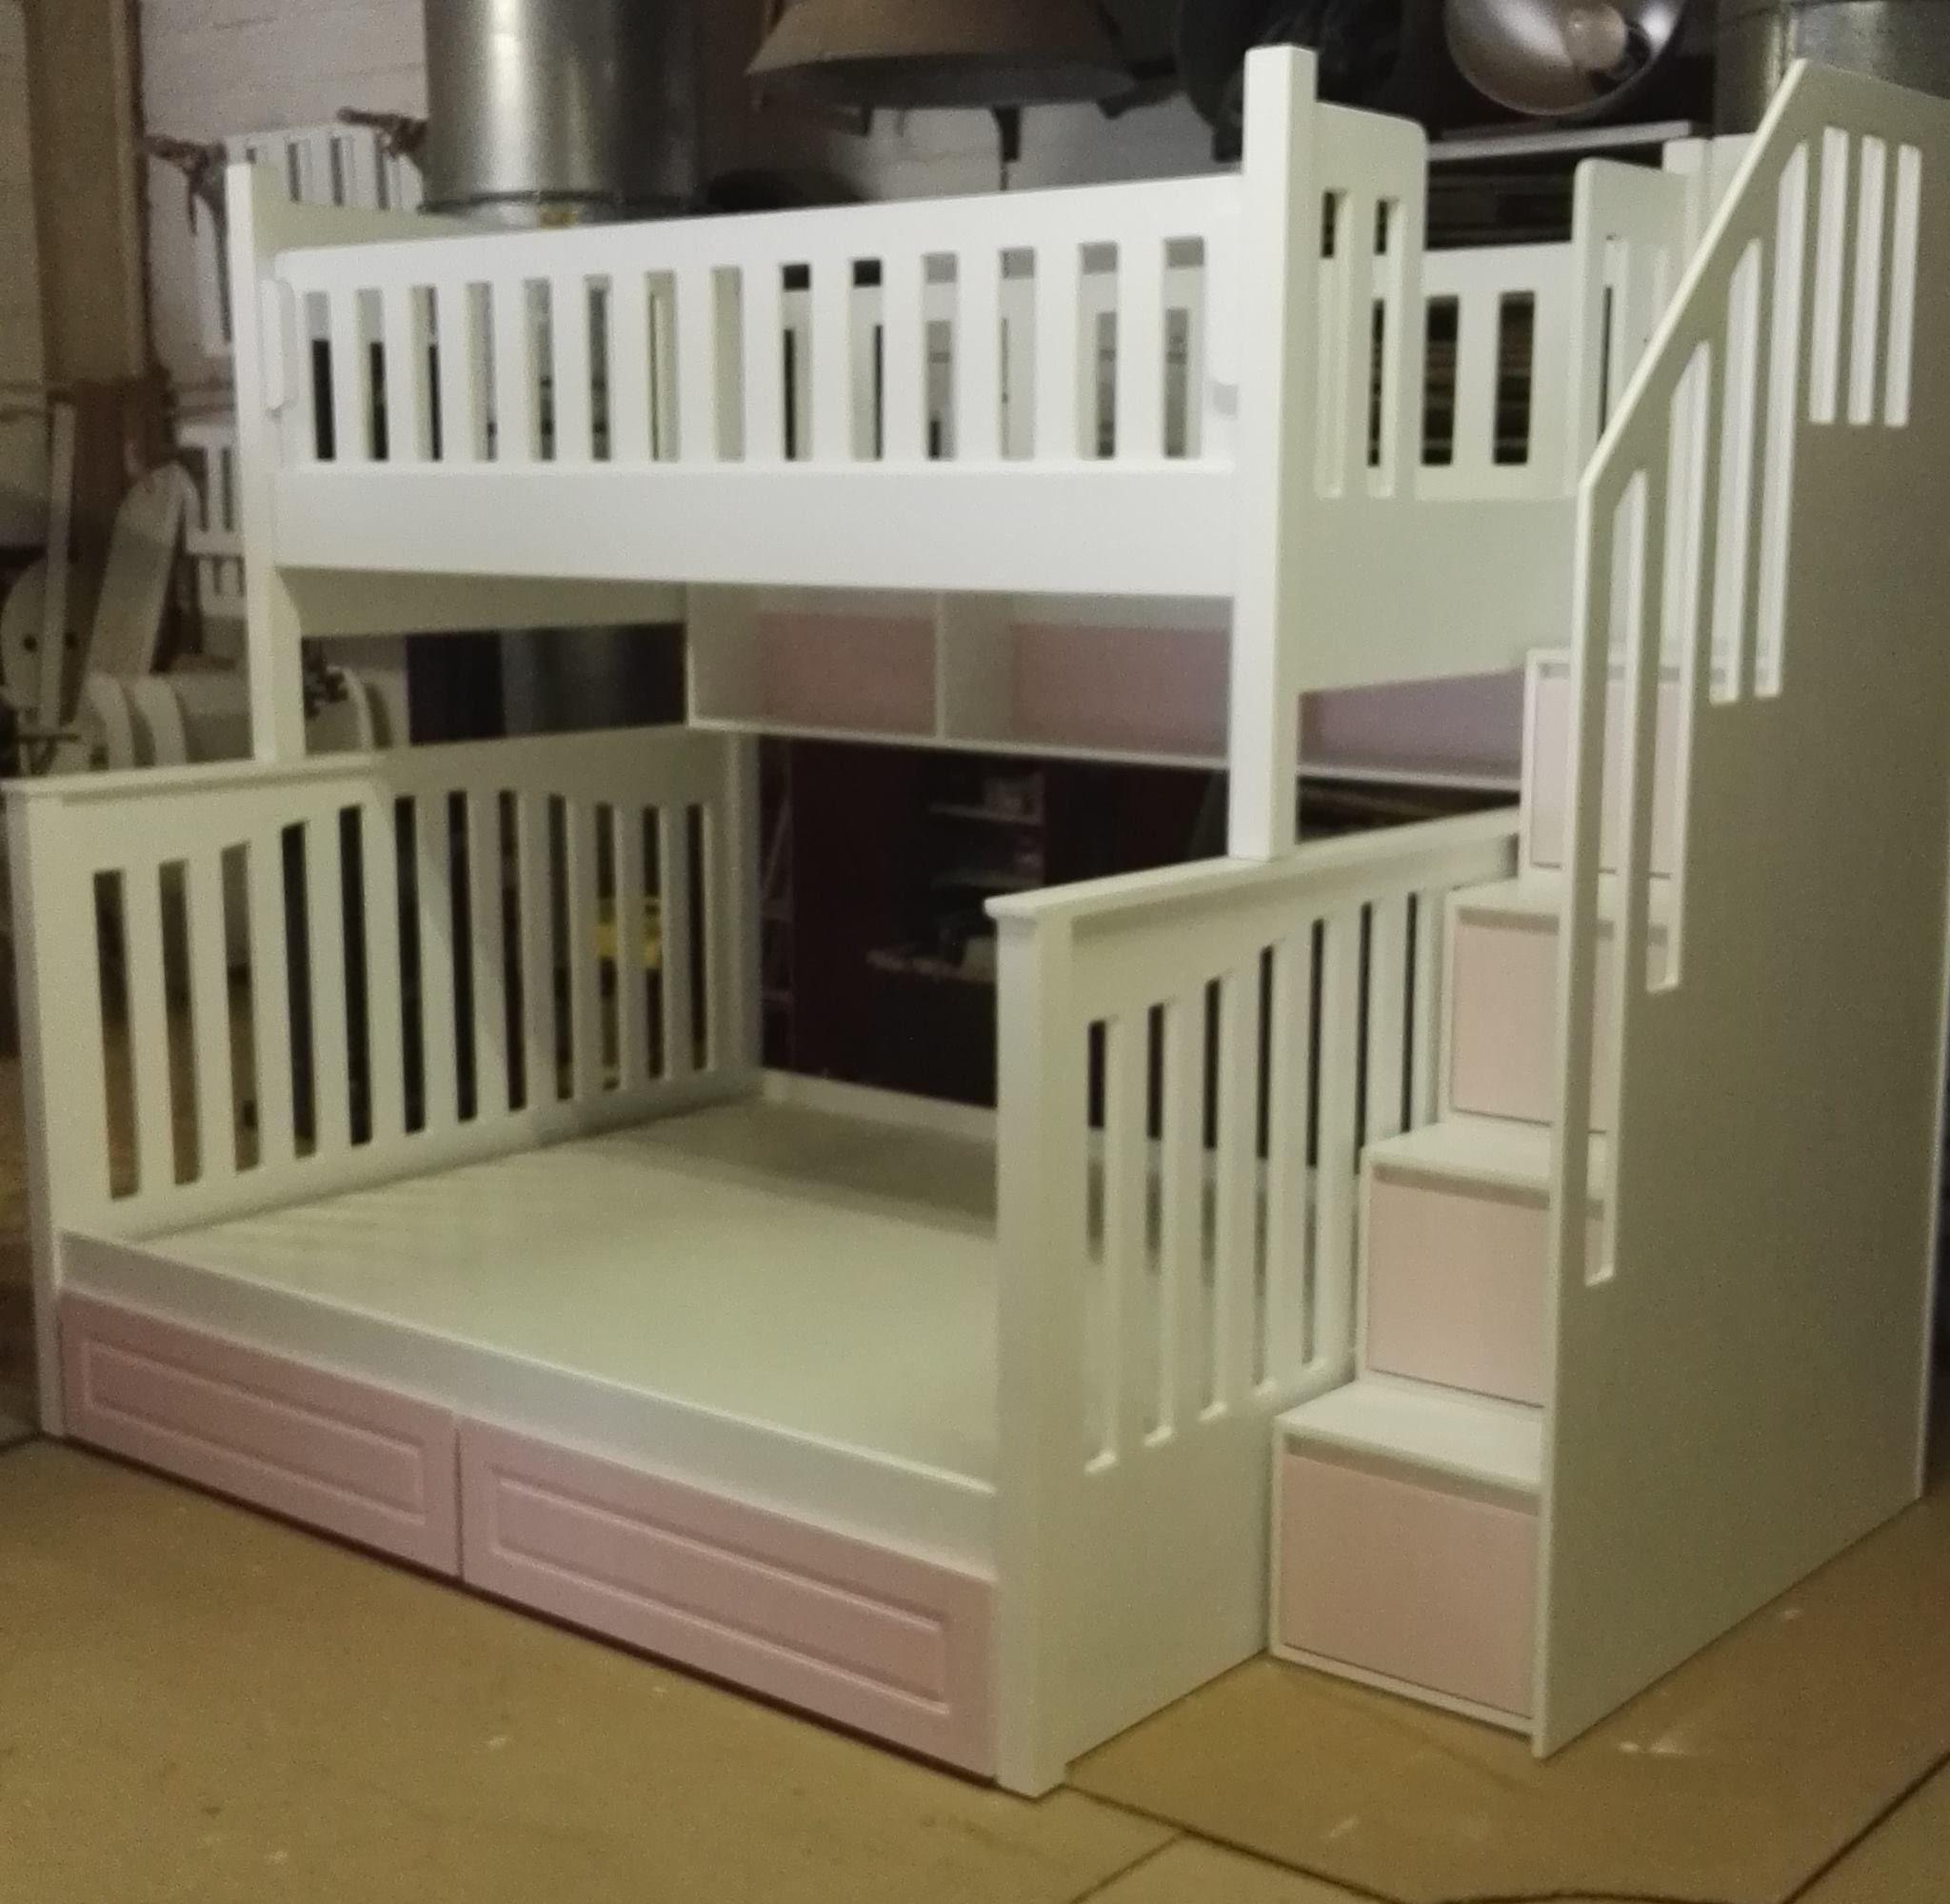 Turn crib into toddler loft bed  Pin by Jolene Field on Kids furniture  Pinterest  Kids furniture